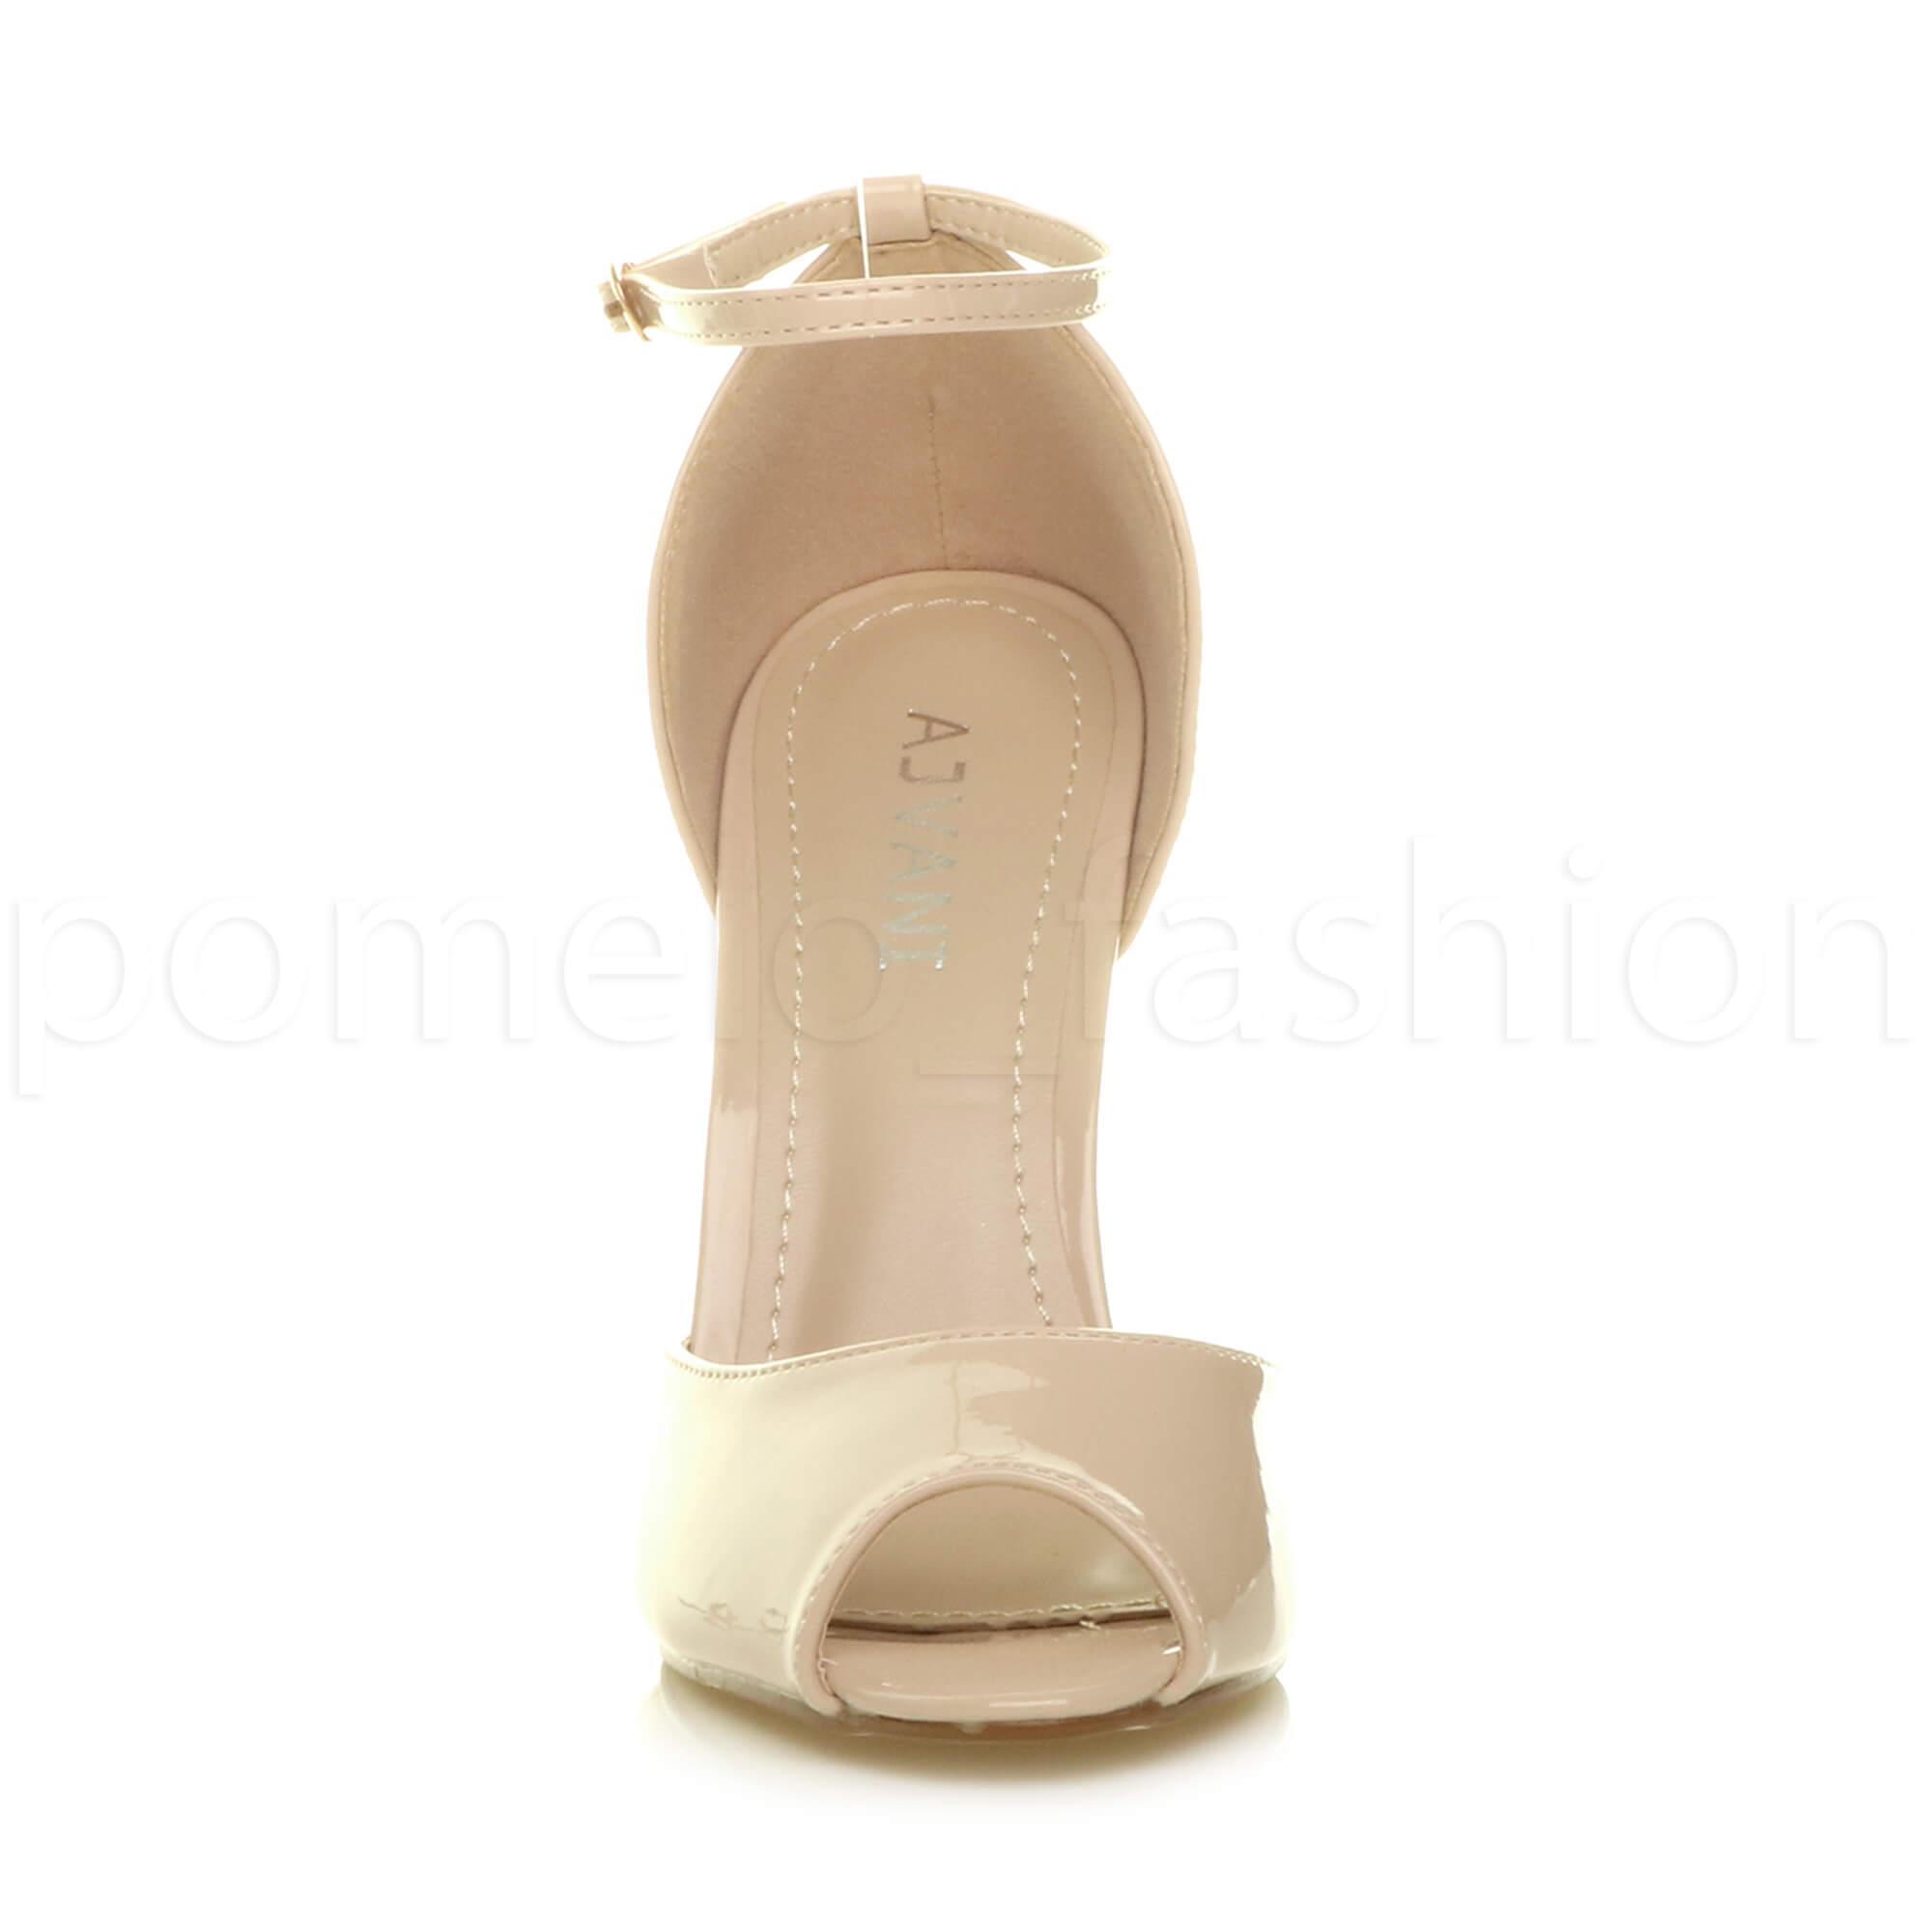 WOMENS-LADIES-HIGH-HEEL-WEDDING-BRIDESMAID-EVENING-STILETTOS-PEEP-TOE-SHOES-SIZE thumbnail 55